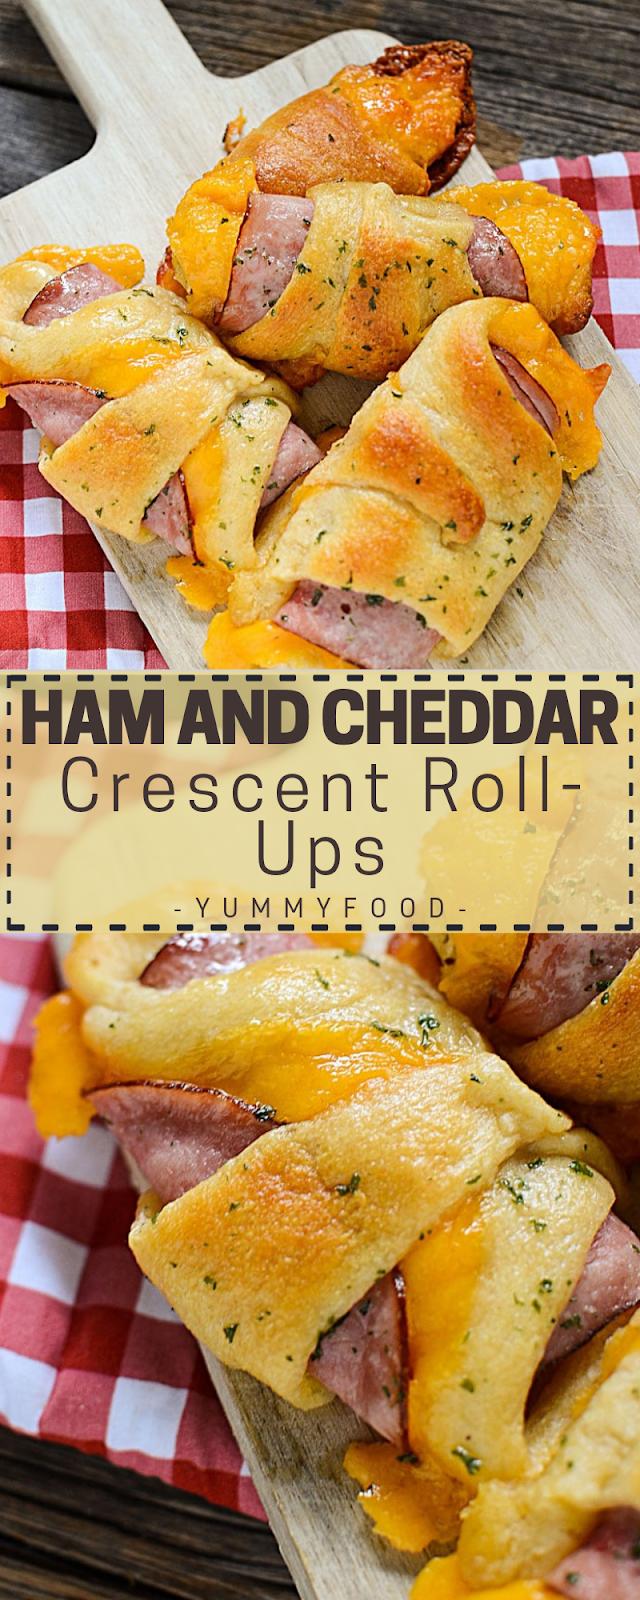 Ham And Cheddar Crescent Roll-Ups